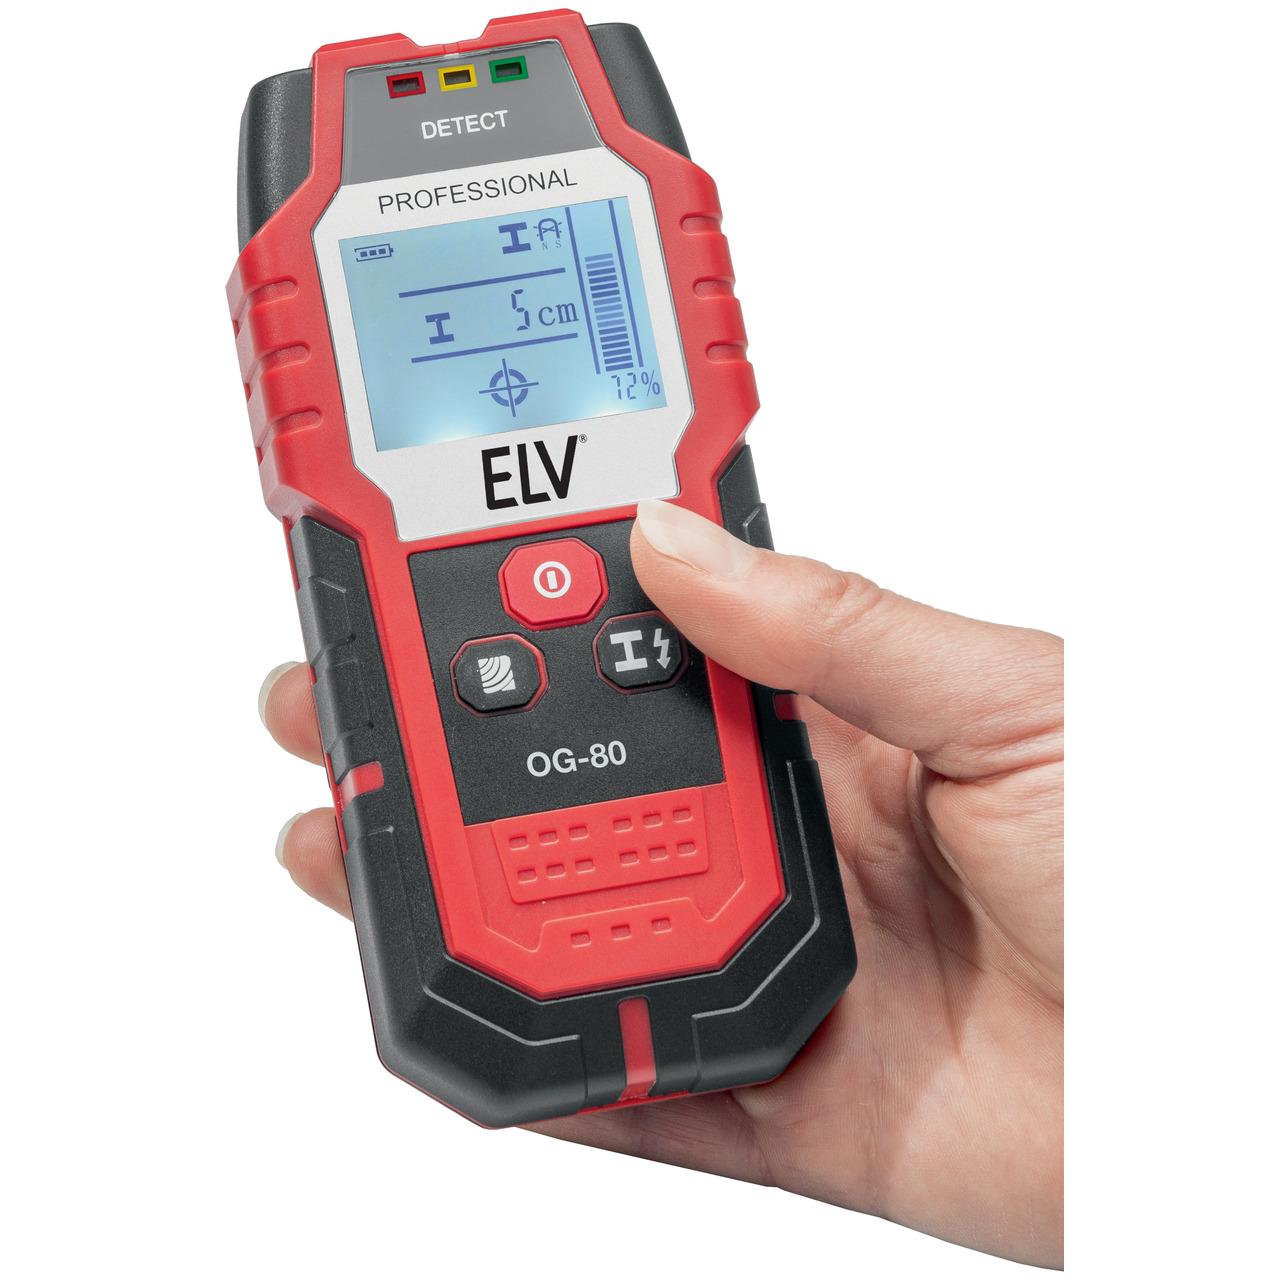 ELV Ortungsgerät OG-80- bis zu 80mm Suchtiefe (Metallträger)